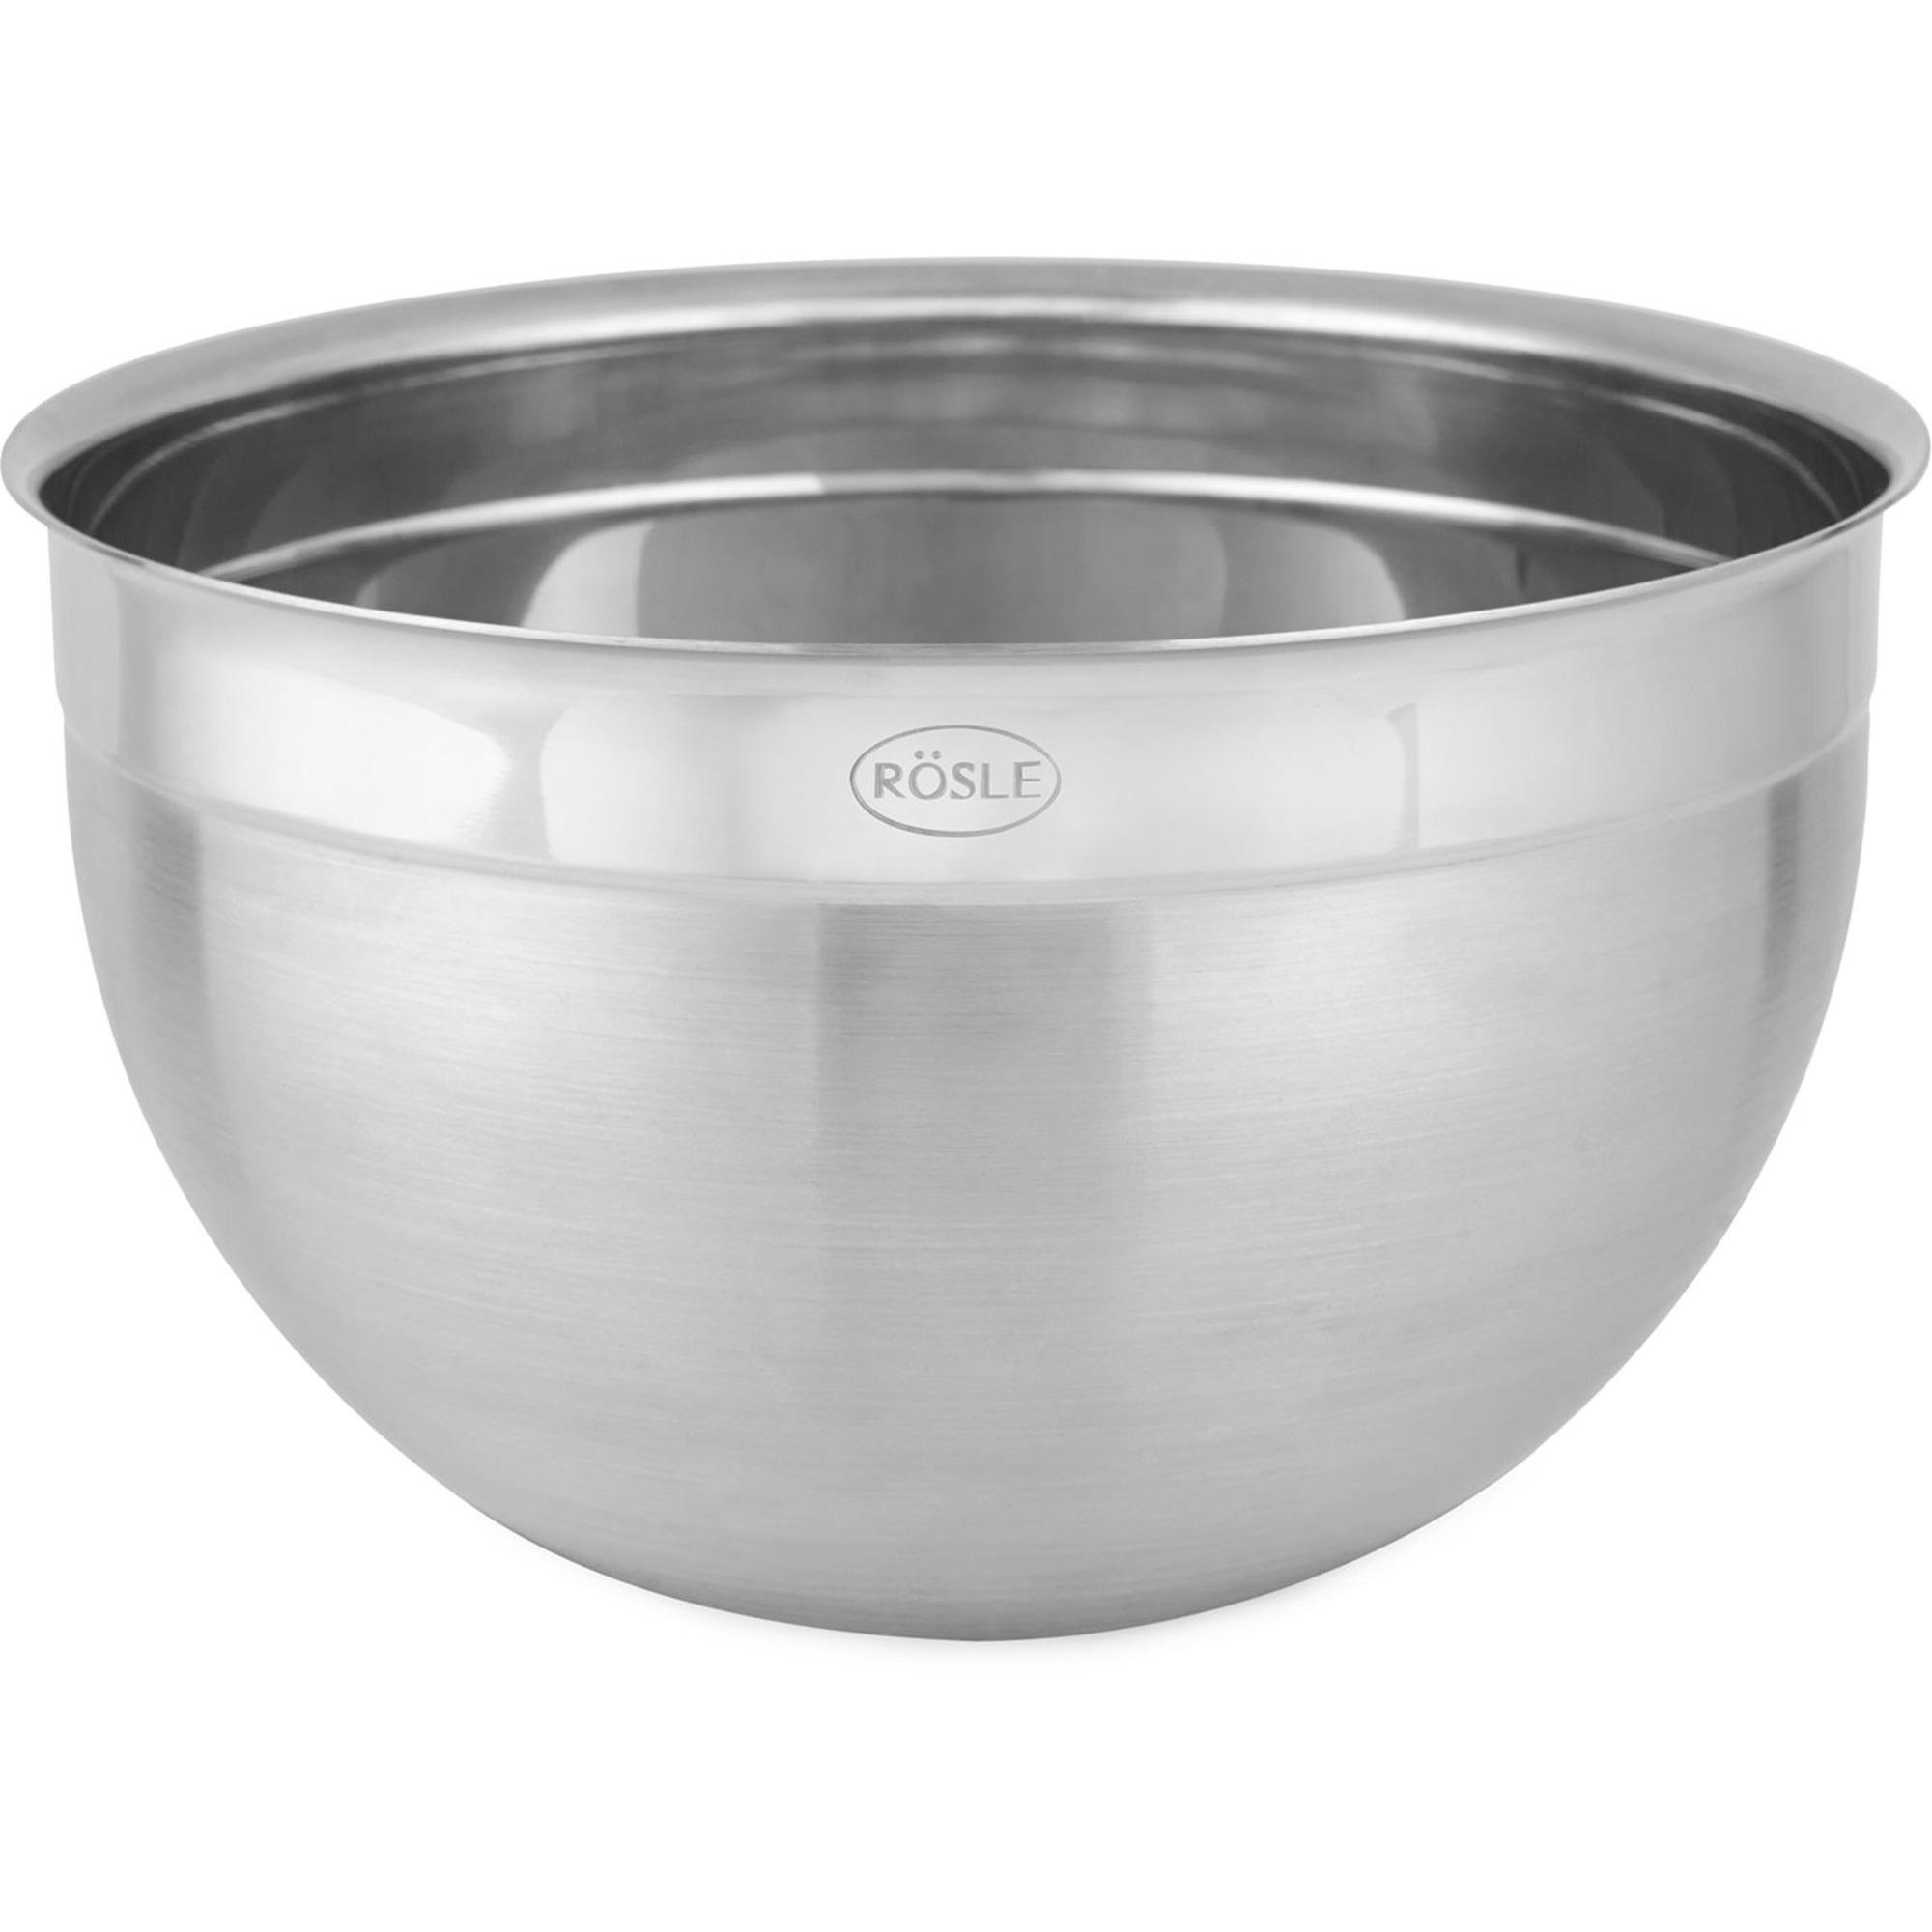 Rösle 02 liter hög skål